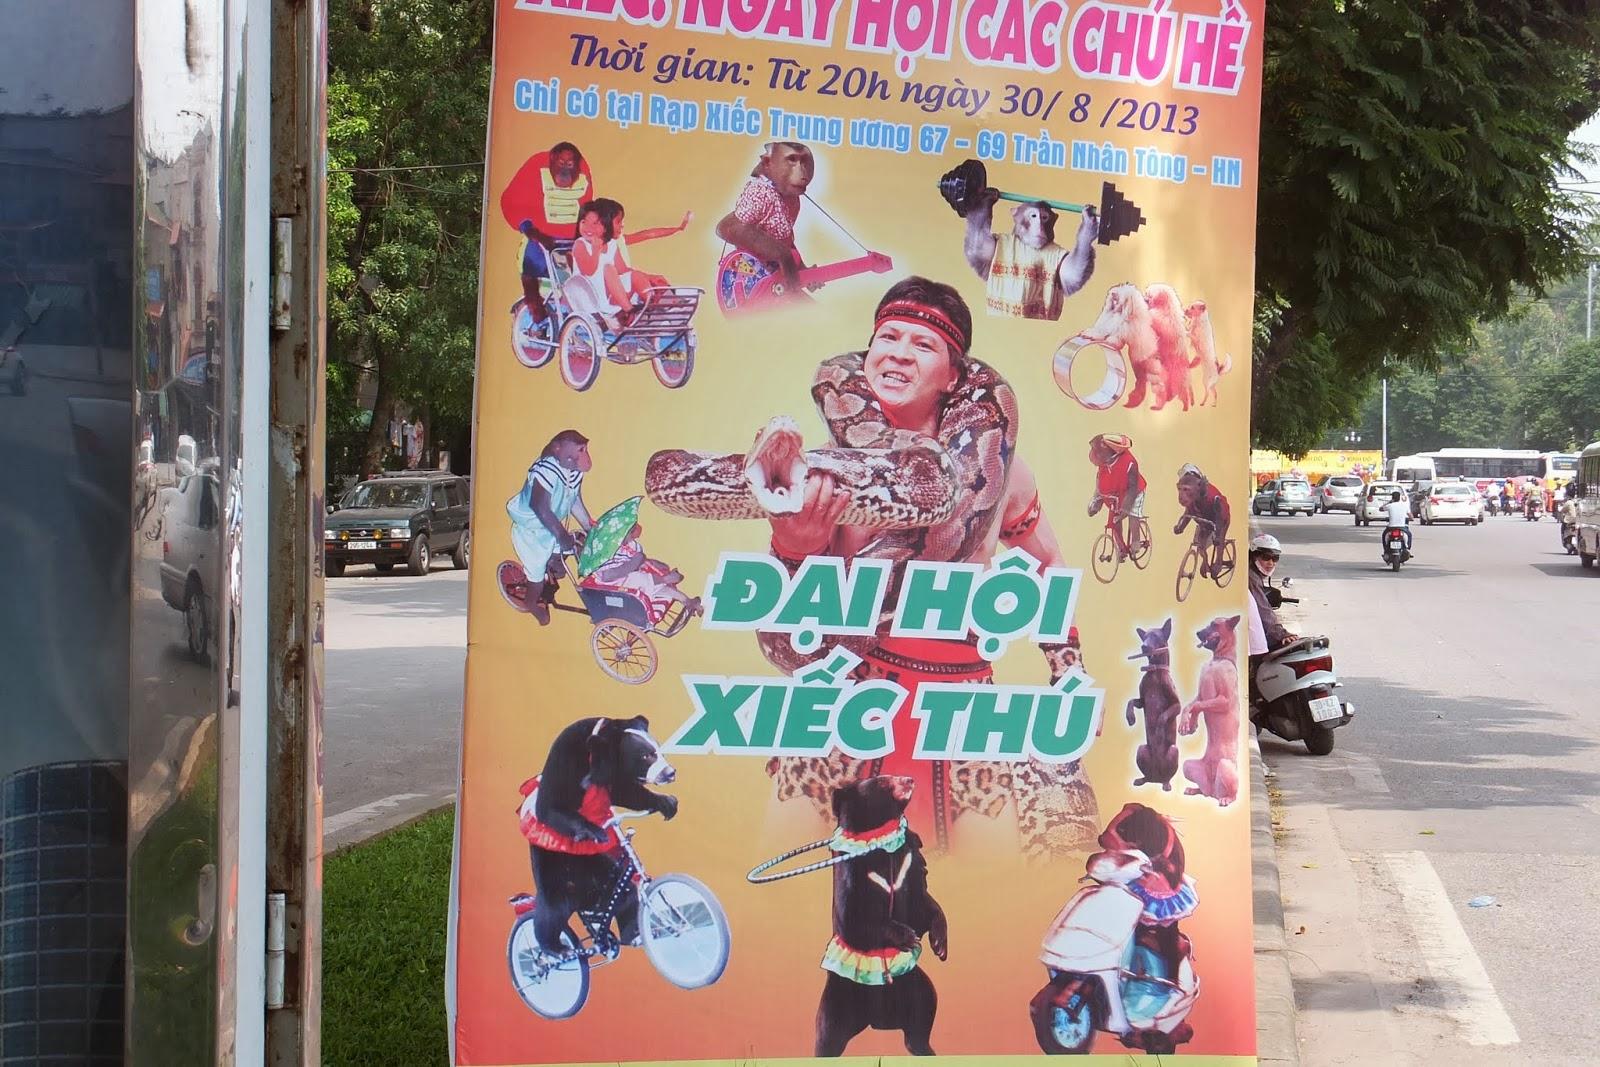 hanoi-circus-ad ハノイサーカス広告:蛇使い